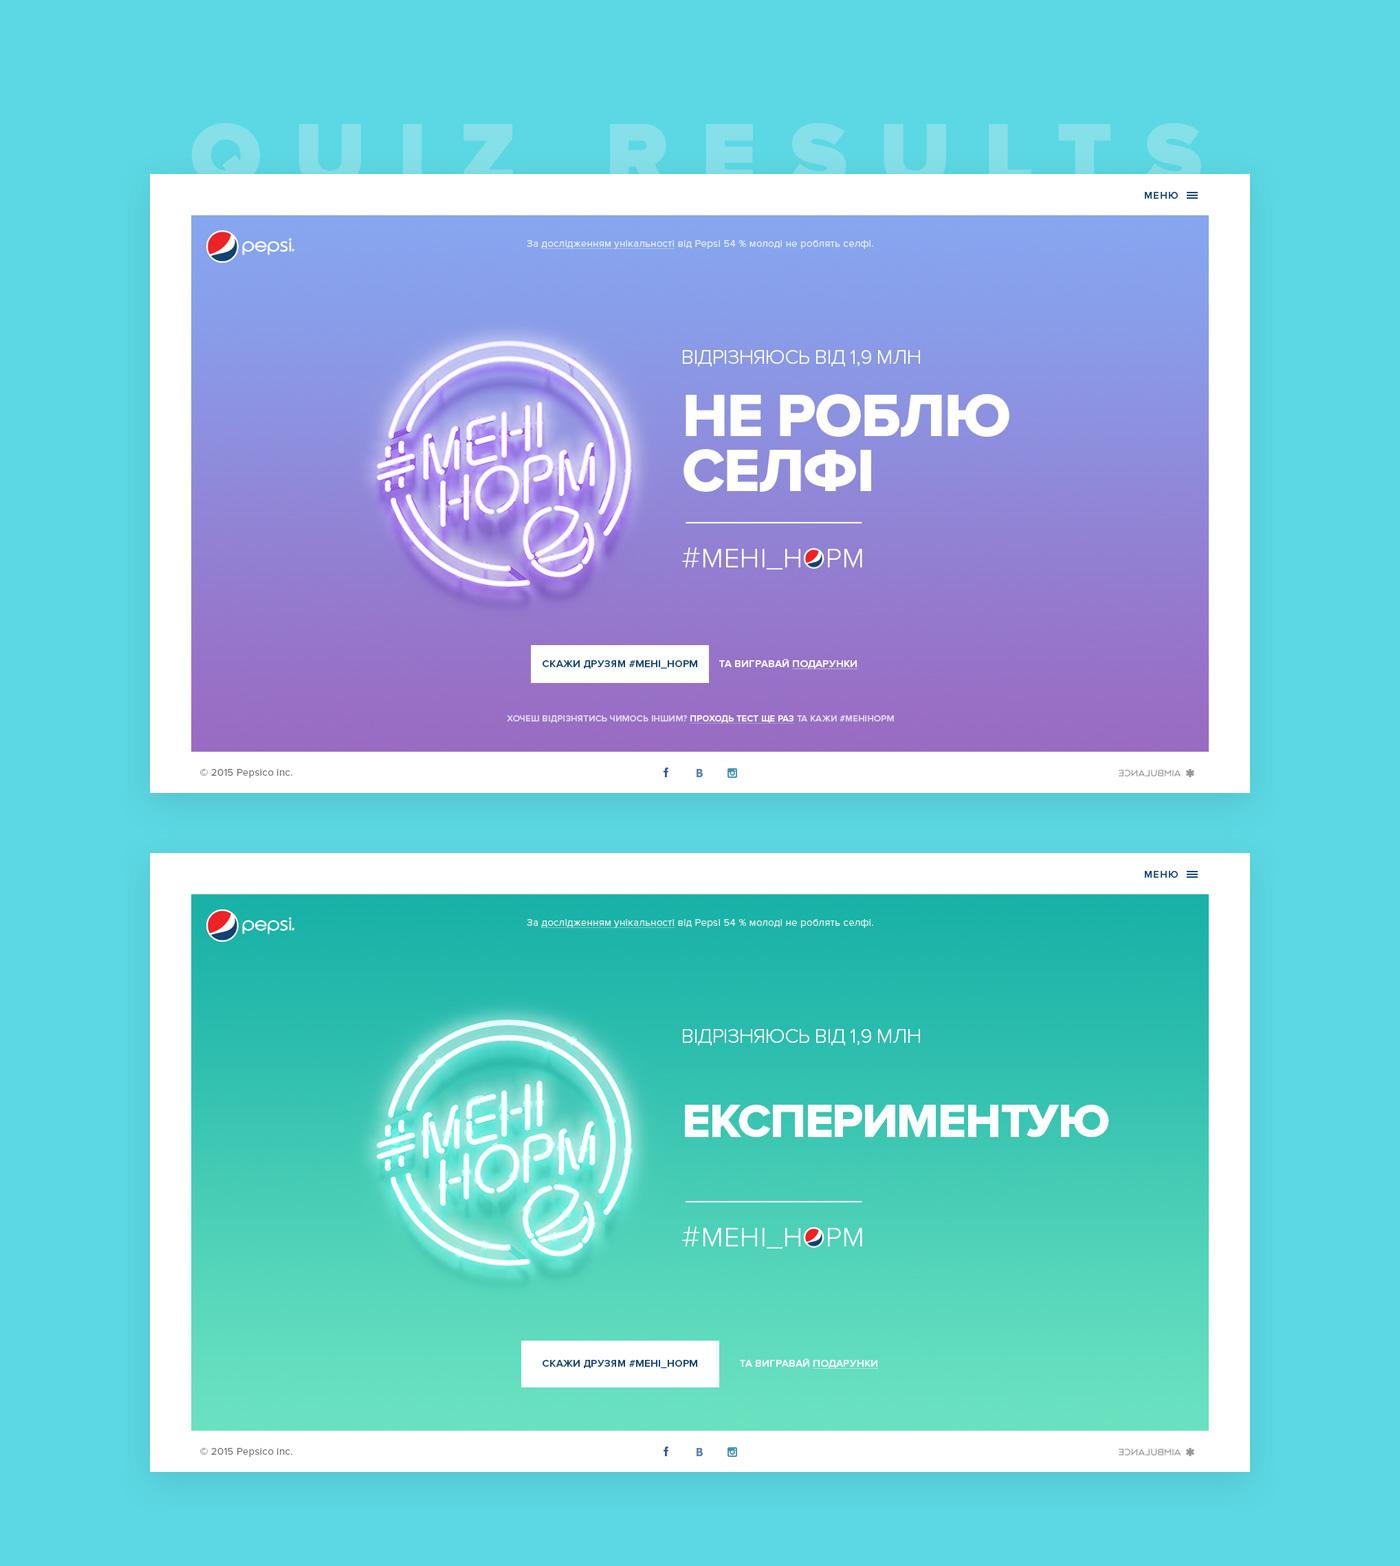 pepsi ukraine aimbulance Quiz colorful Responsive photo retouch